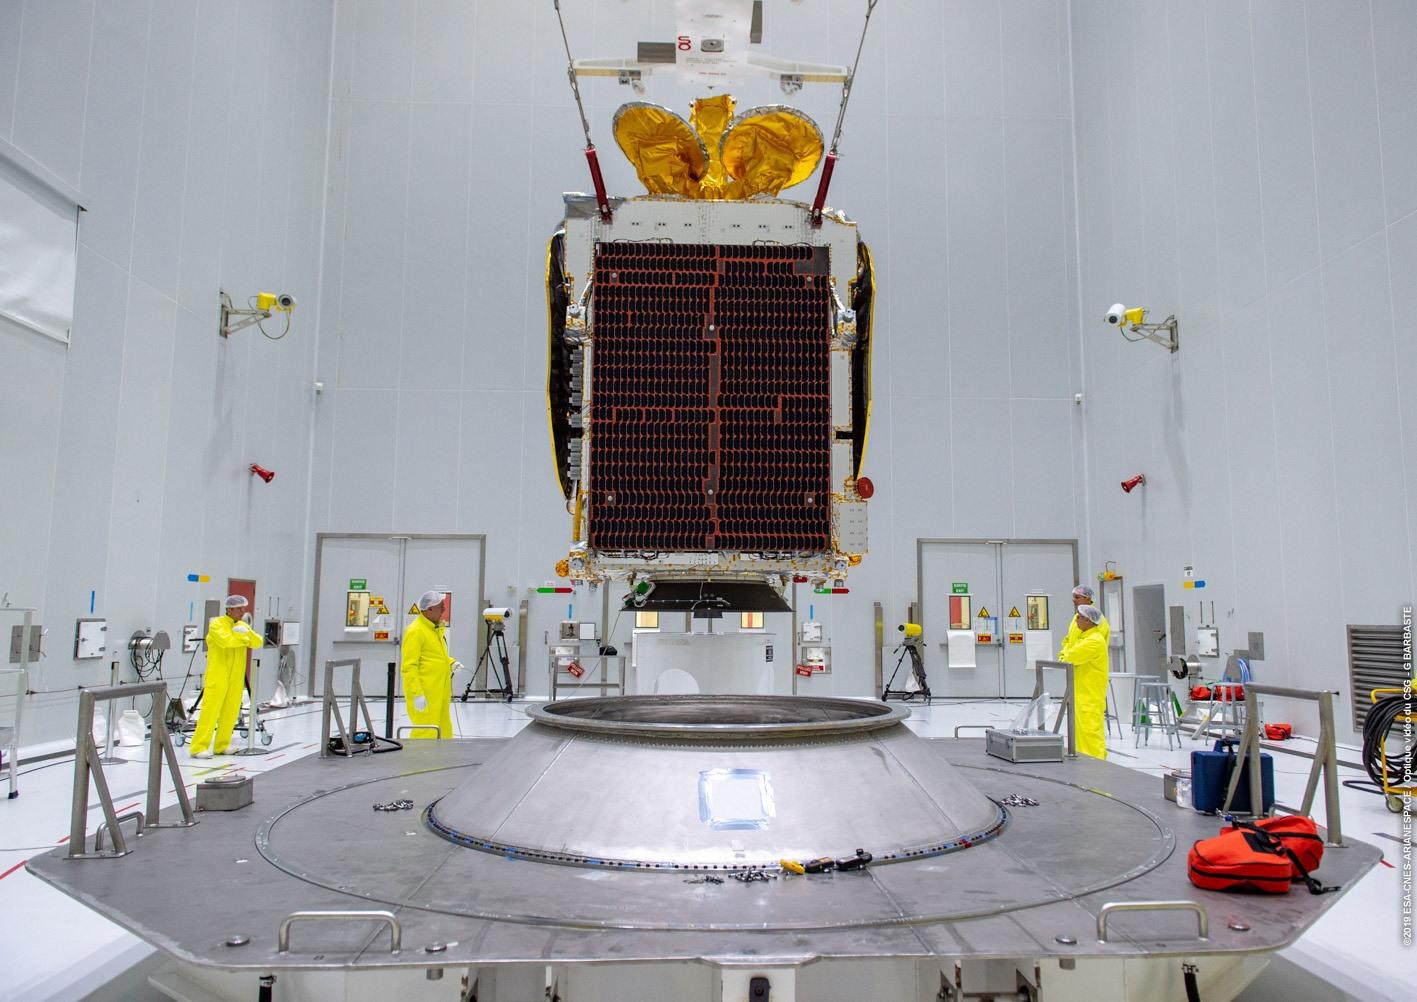 Launch of 250th Ariane rocket marks new era for Inmarsat broadband fleet